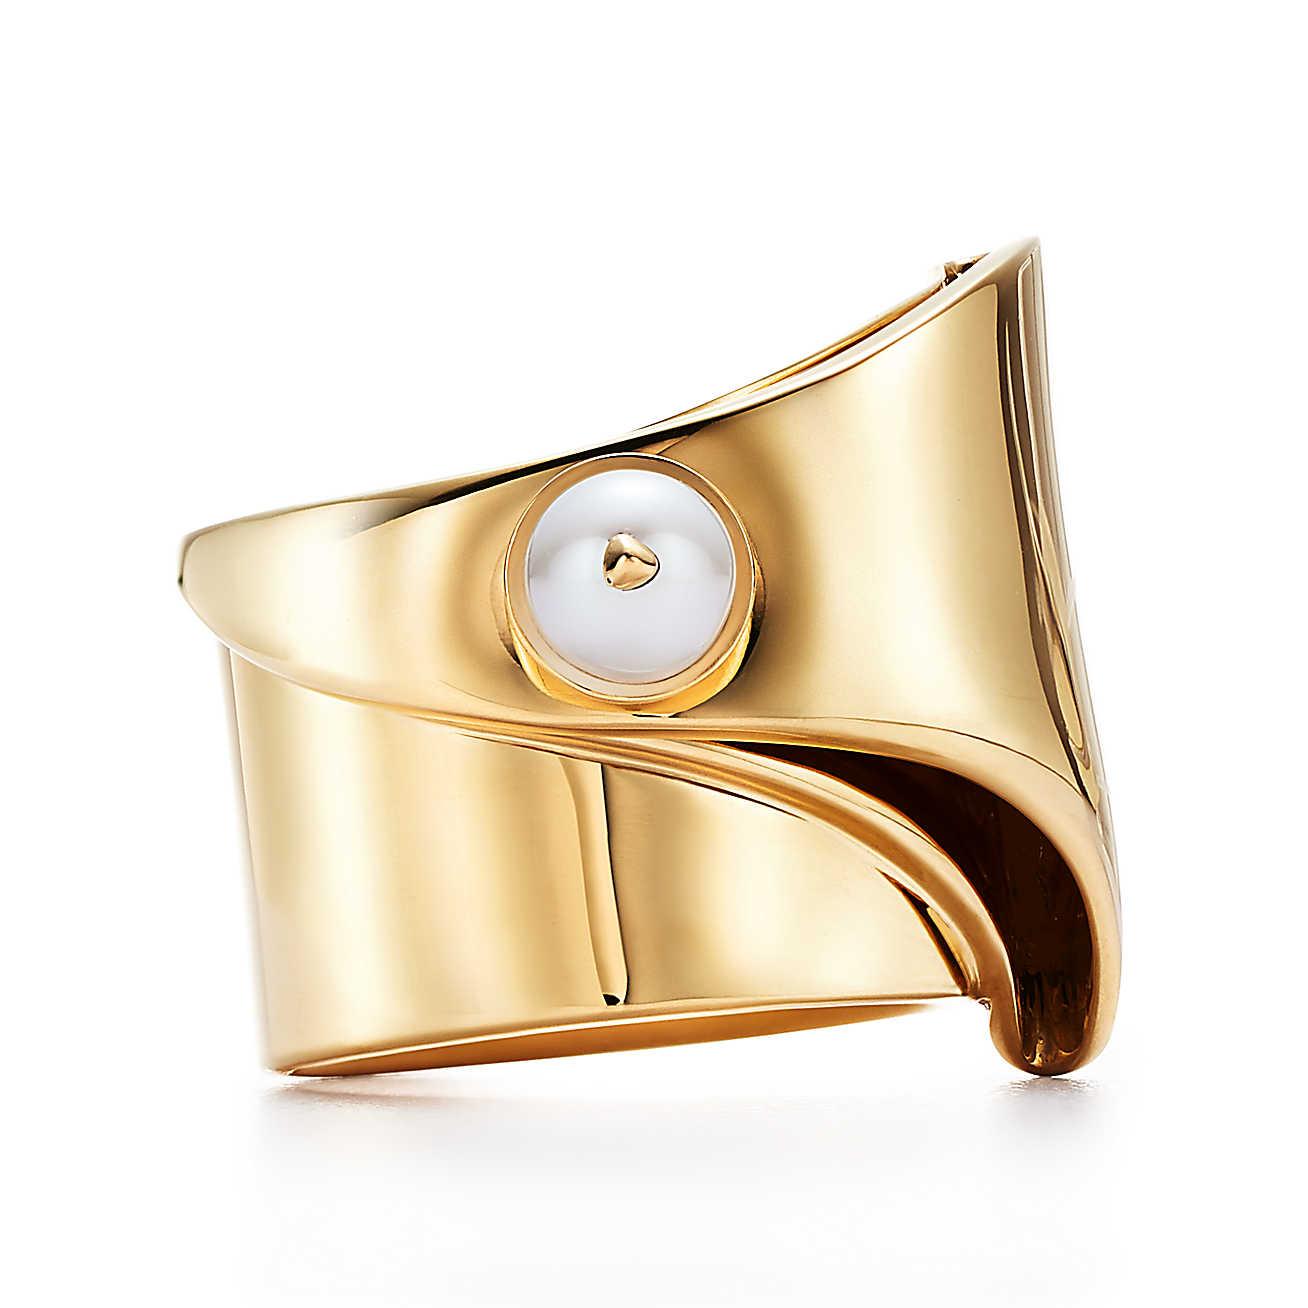 d4fe6af1a3fa Tiffany x Eddie Borgo ring in 18k gold with a freshwater pearl.